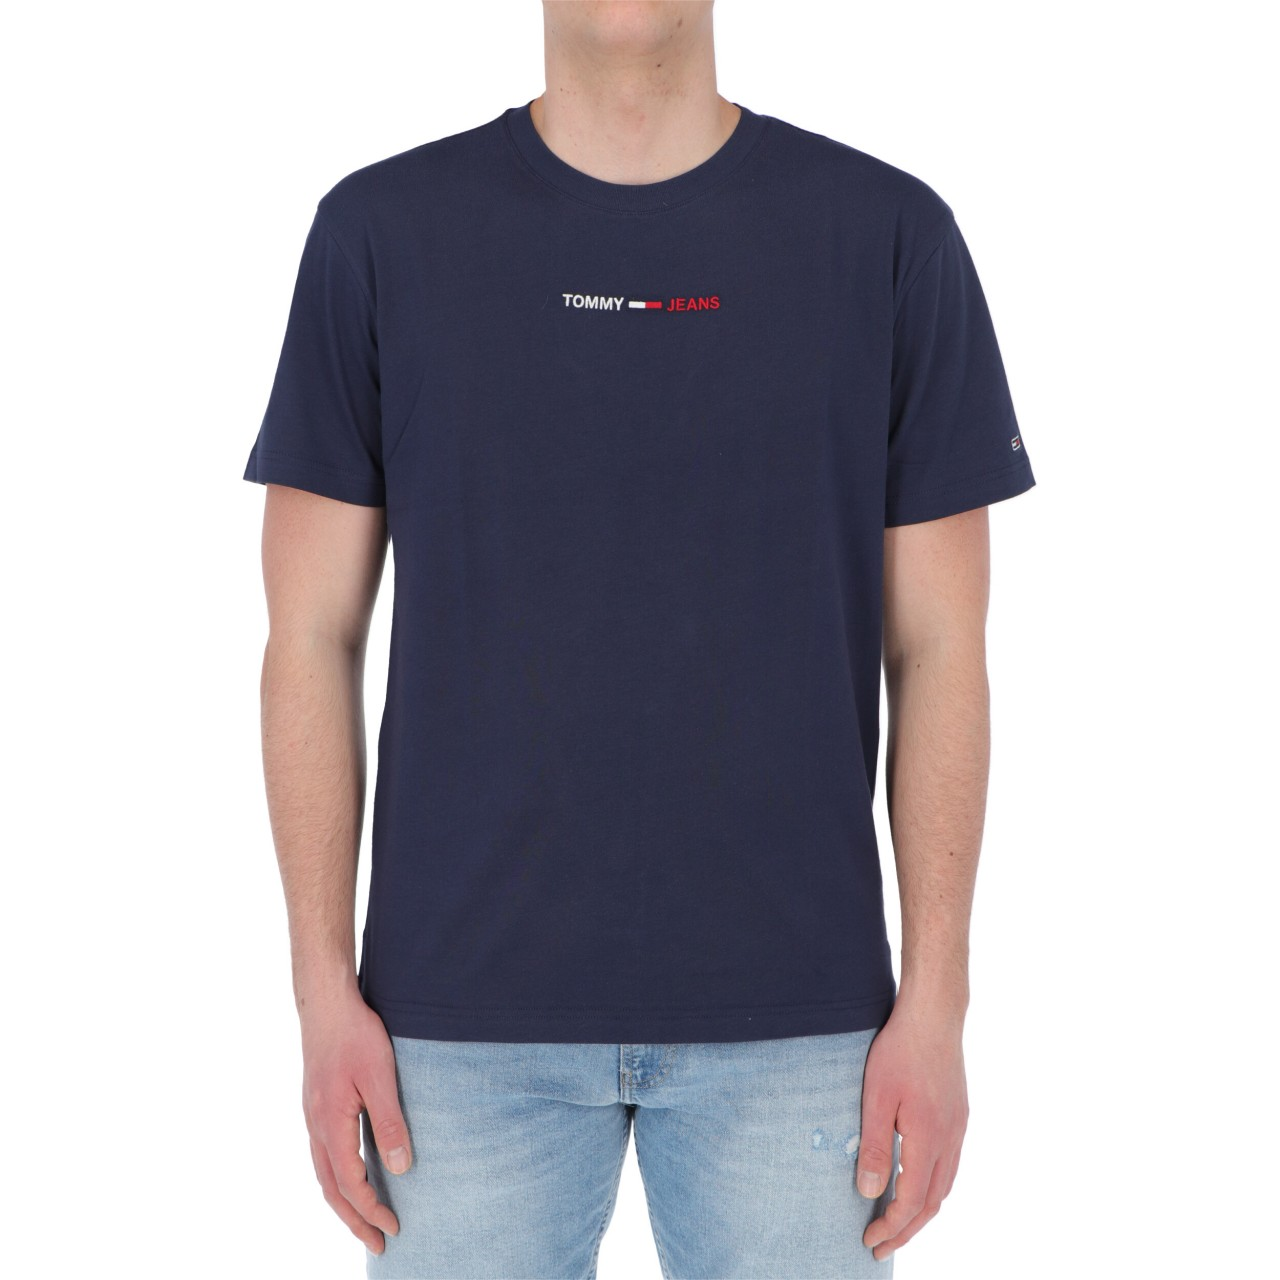 Tommy hilfiger Uomo Tshirt Tommy Hilfiger Jeans Uomo Linear Logo Tee 10219P